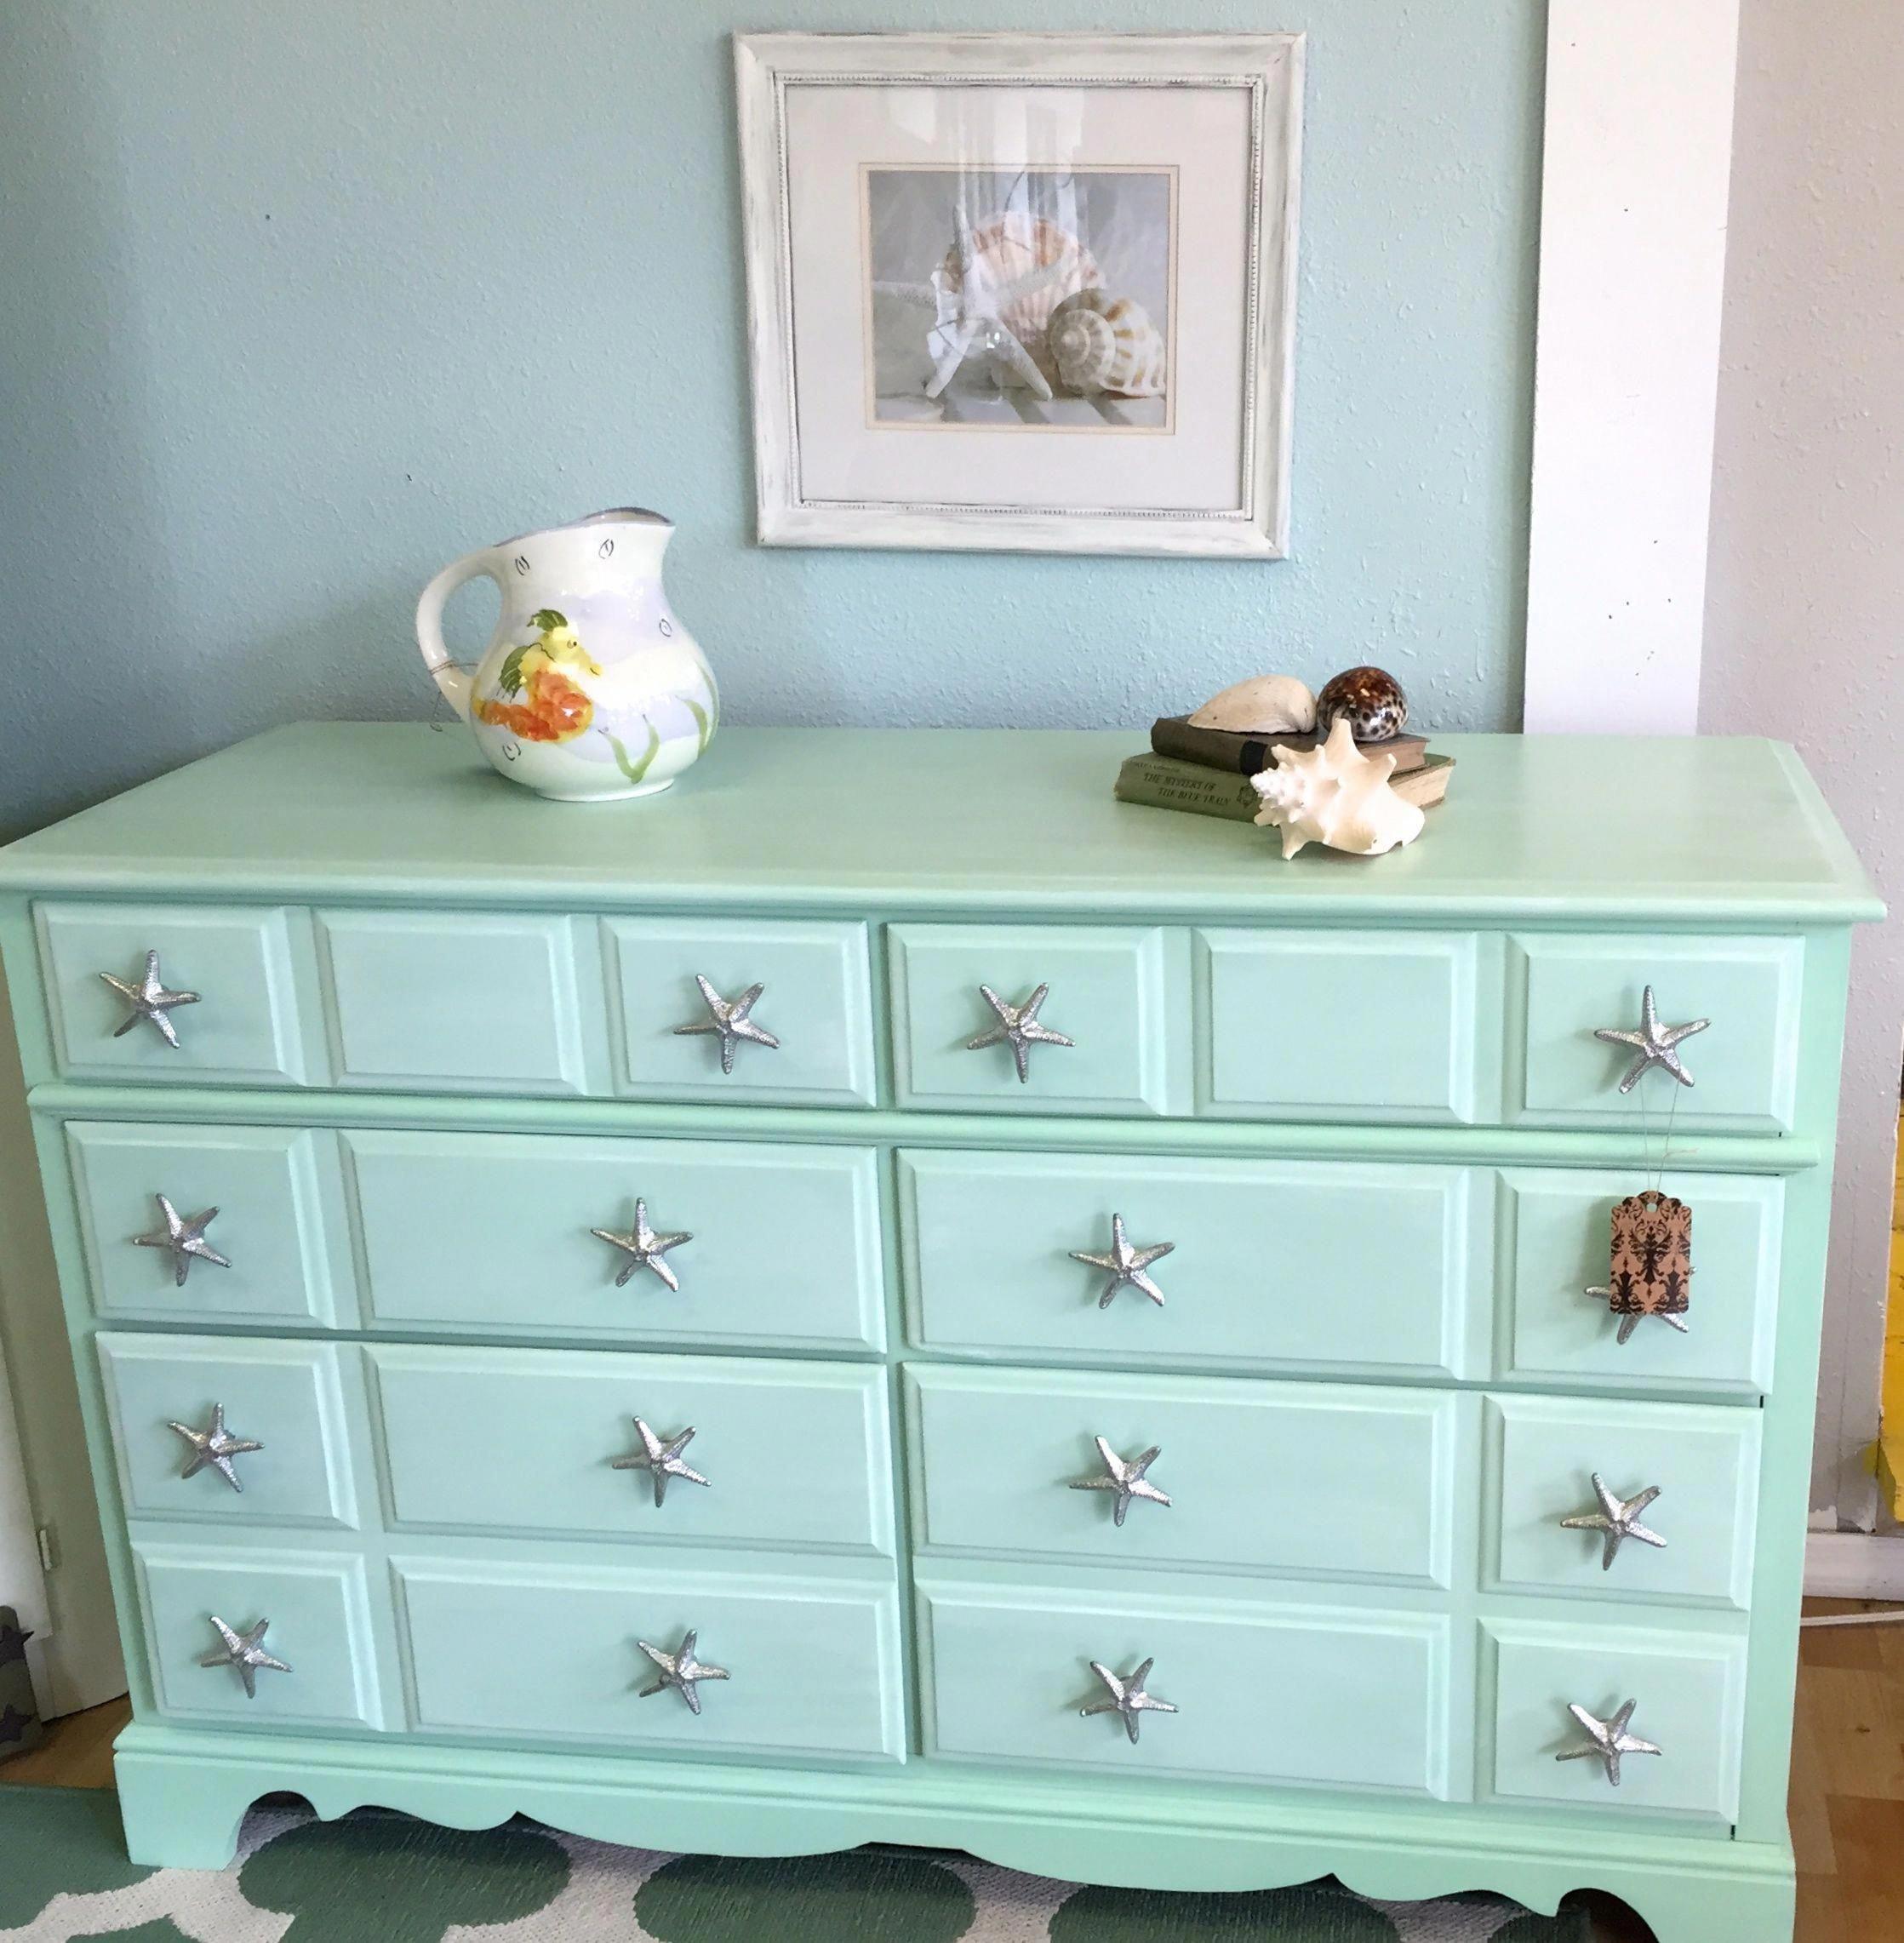 Affordable Nursery Decorating Ideas: Cheap Shabby Chic Decor